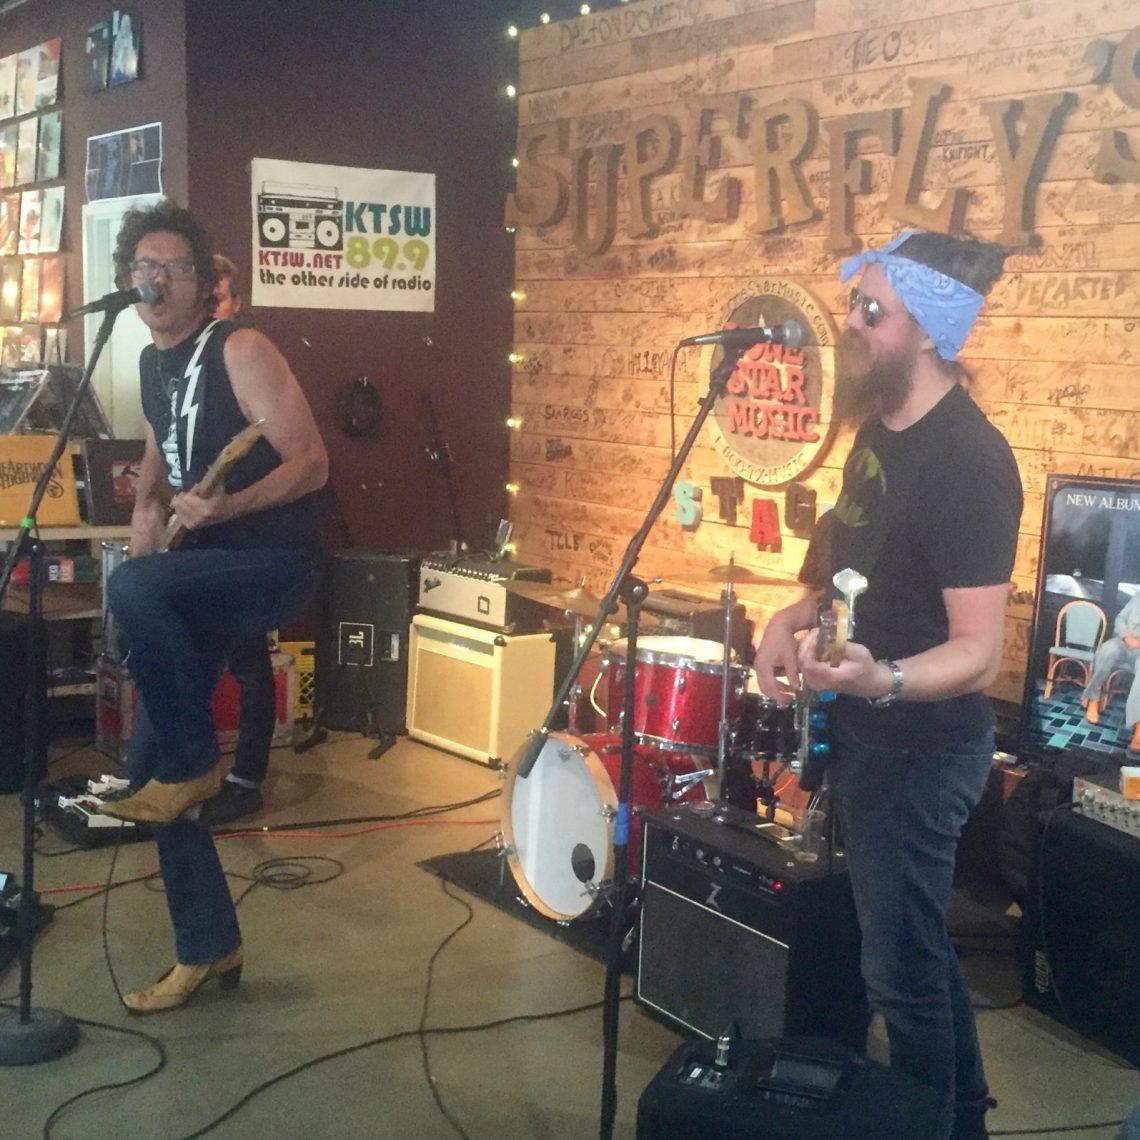 John Evans Band at Superfly's Lone Star Music Emporium in San Marcos, Texas. (Photo by Richard Skanse)